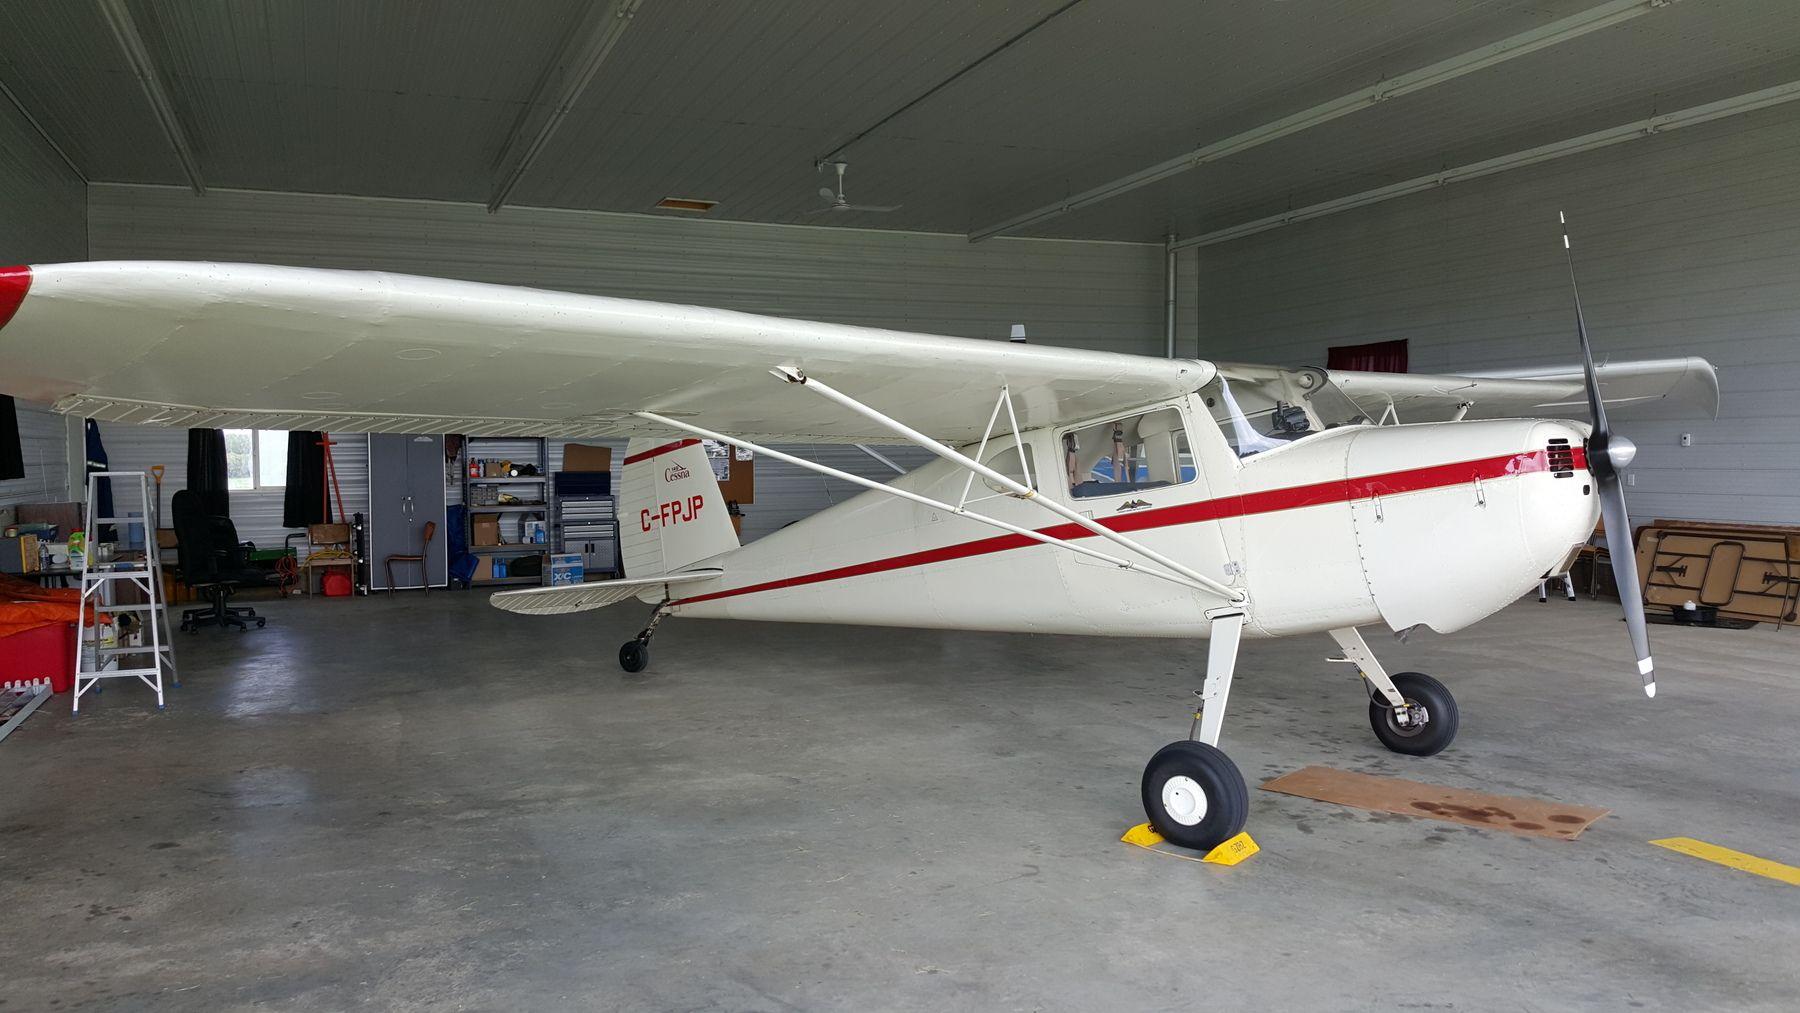 1946 Cessna 140 for sale in (cep3) Barrhead, AB Canada